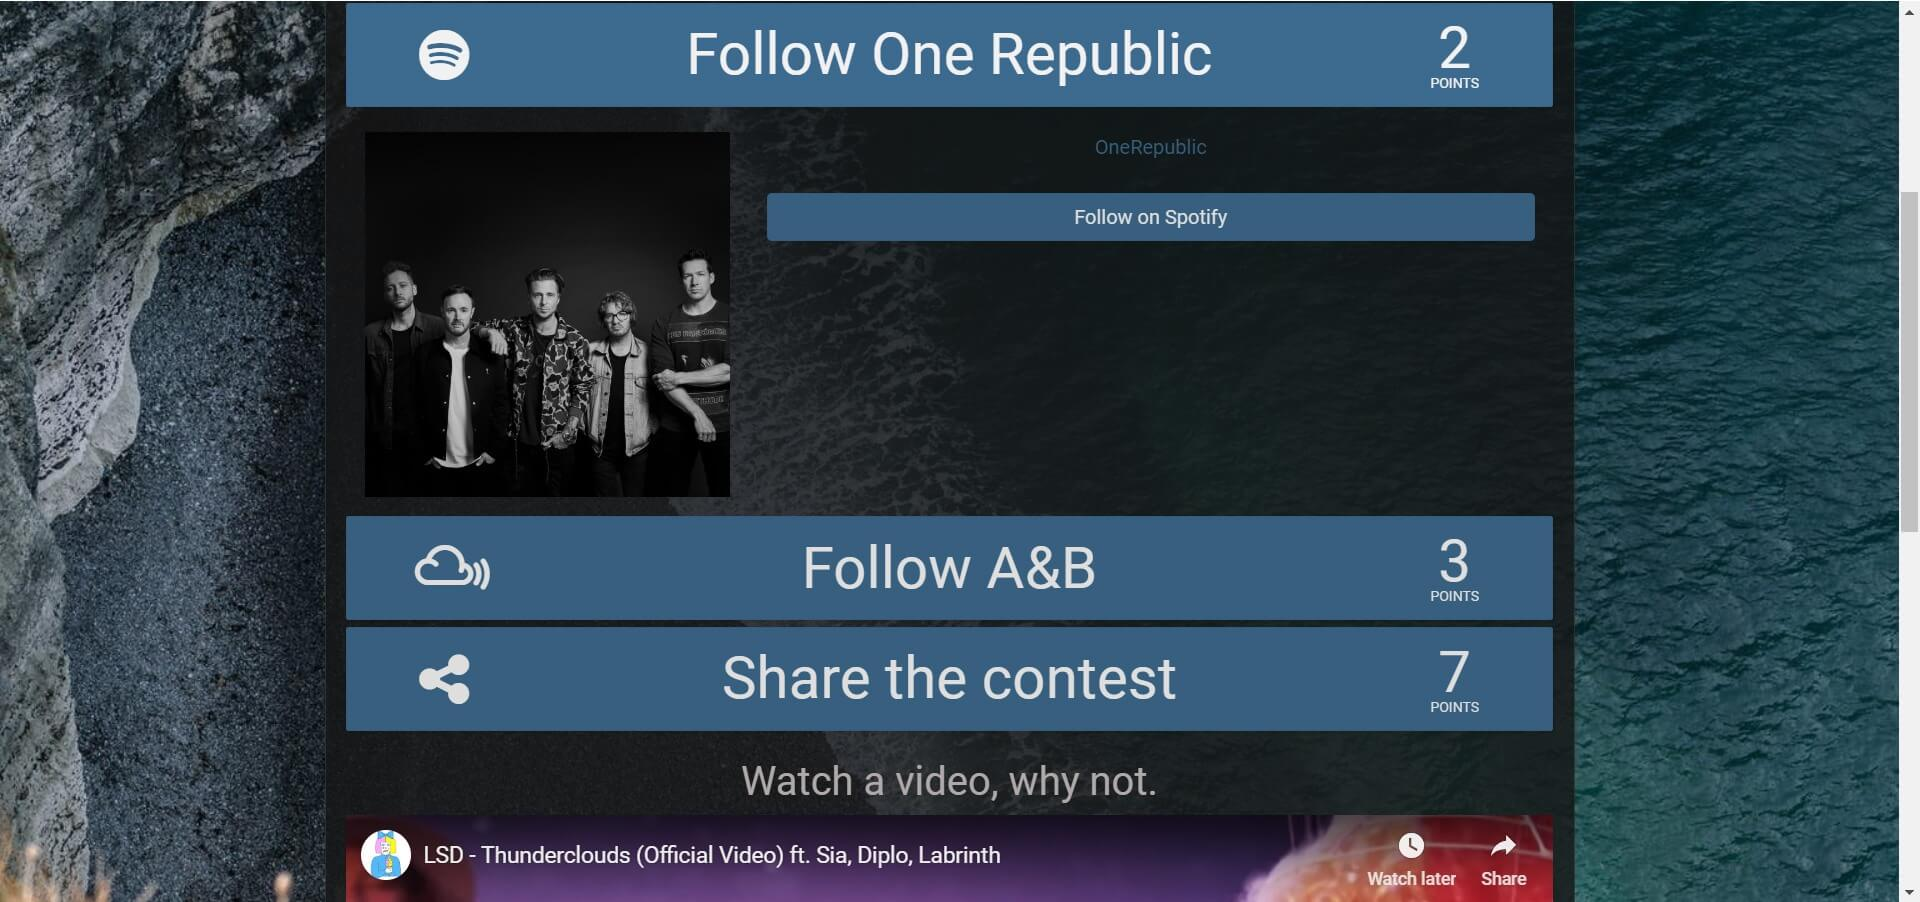 Contest app